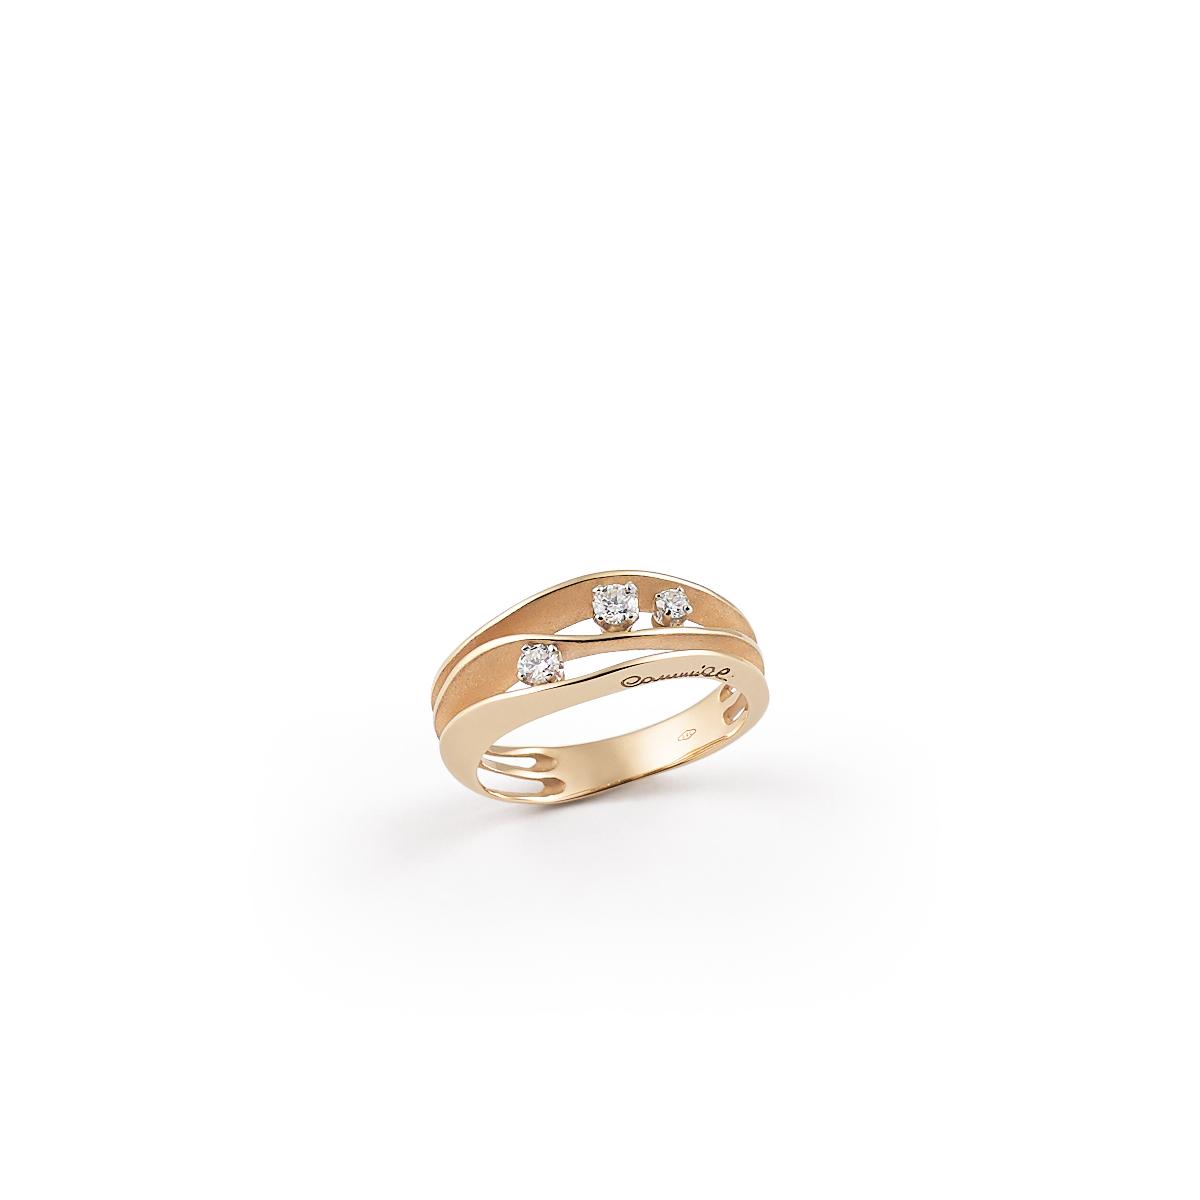 Annamaria Cammilli Dune Ring aus 18 Karat Orange Apricot Gold mit Brillanten